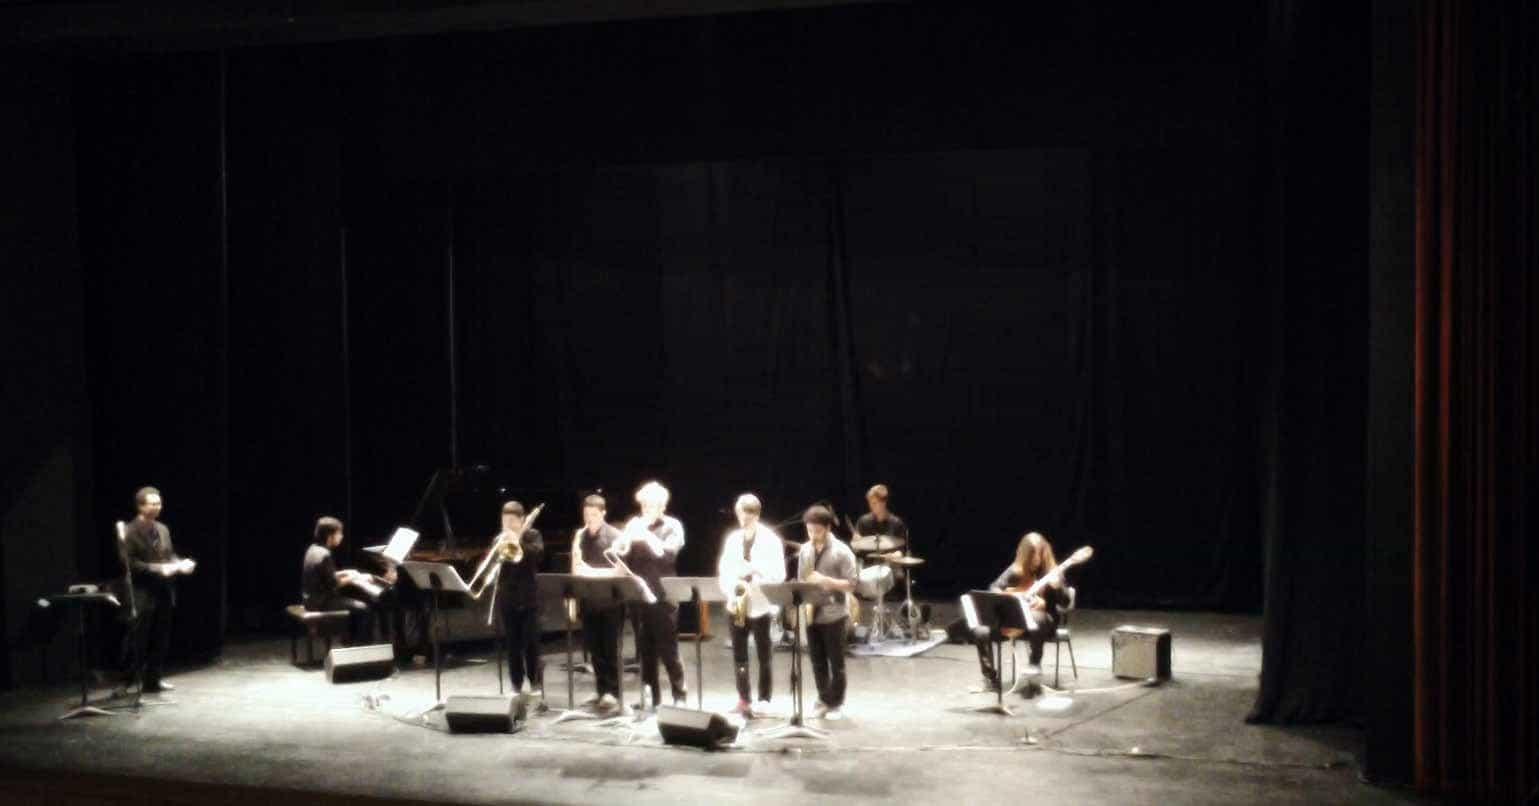 ICM Latin Band at Wix Hall